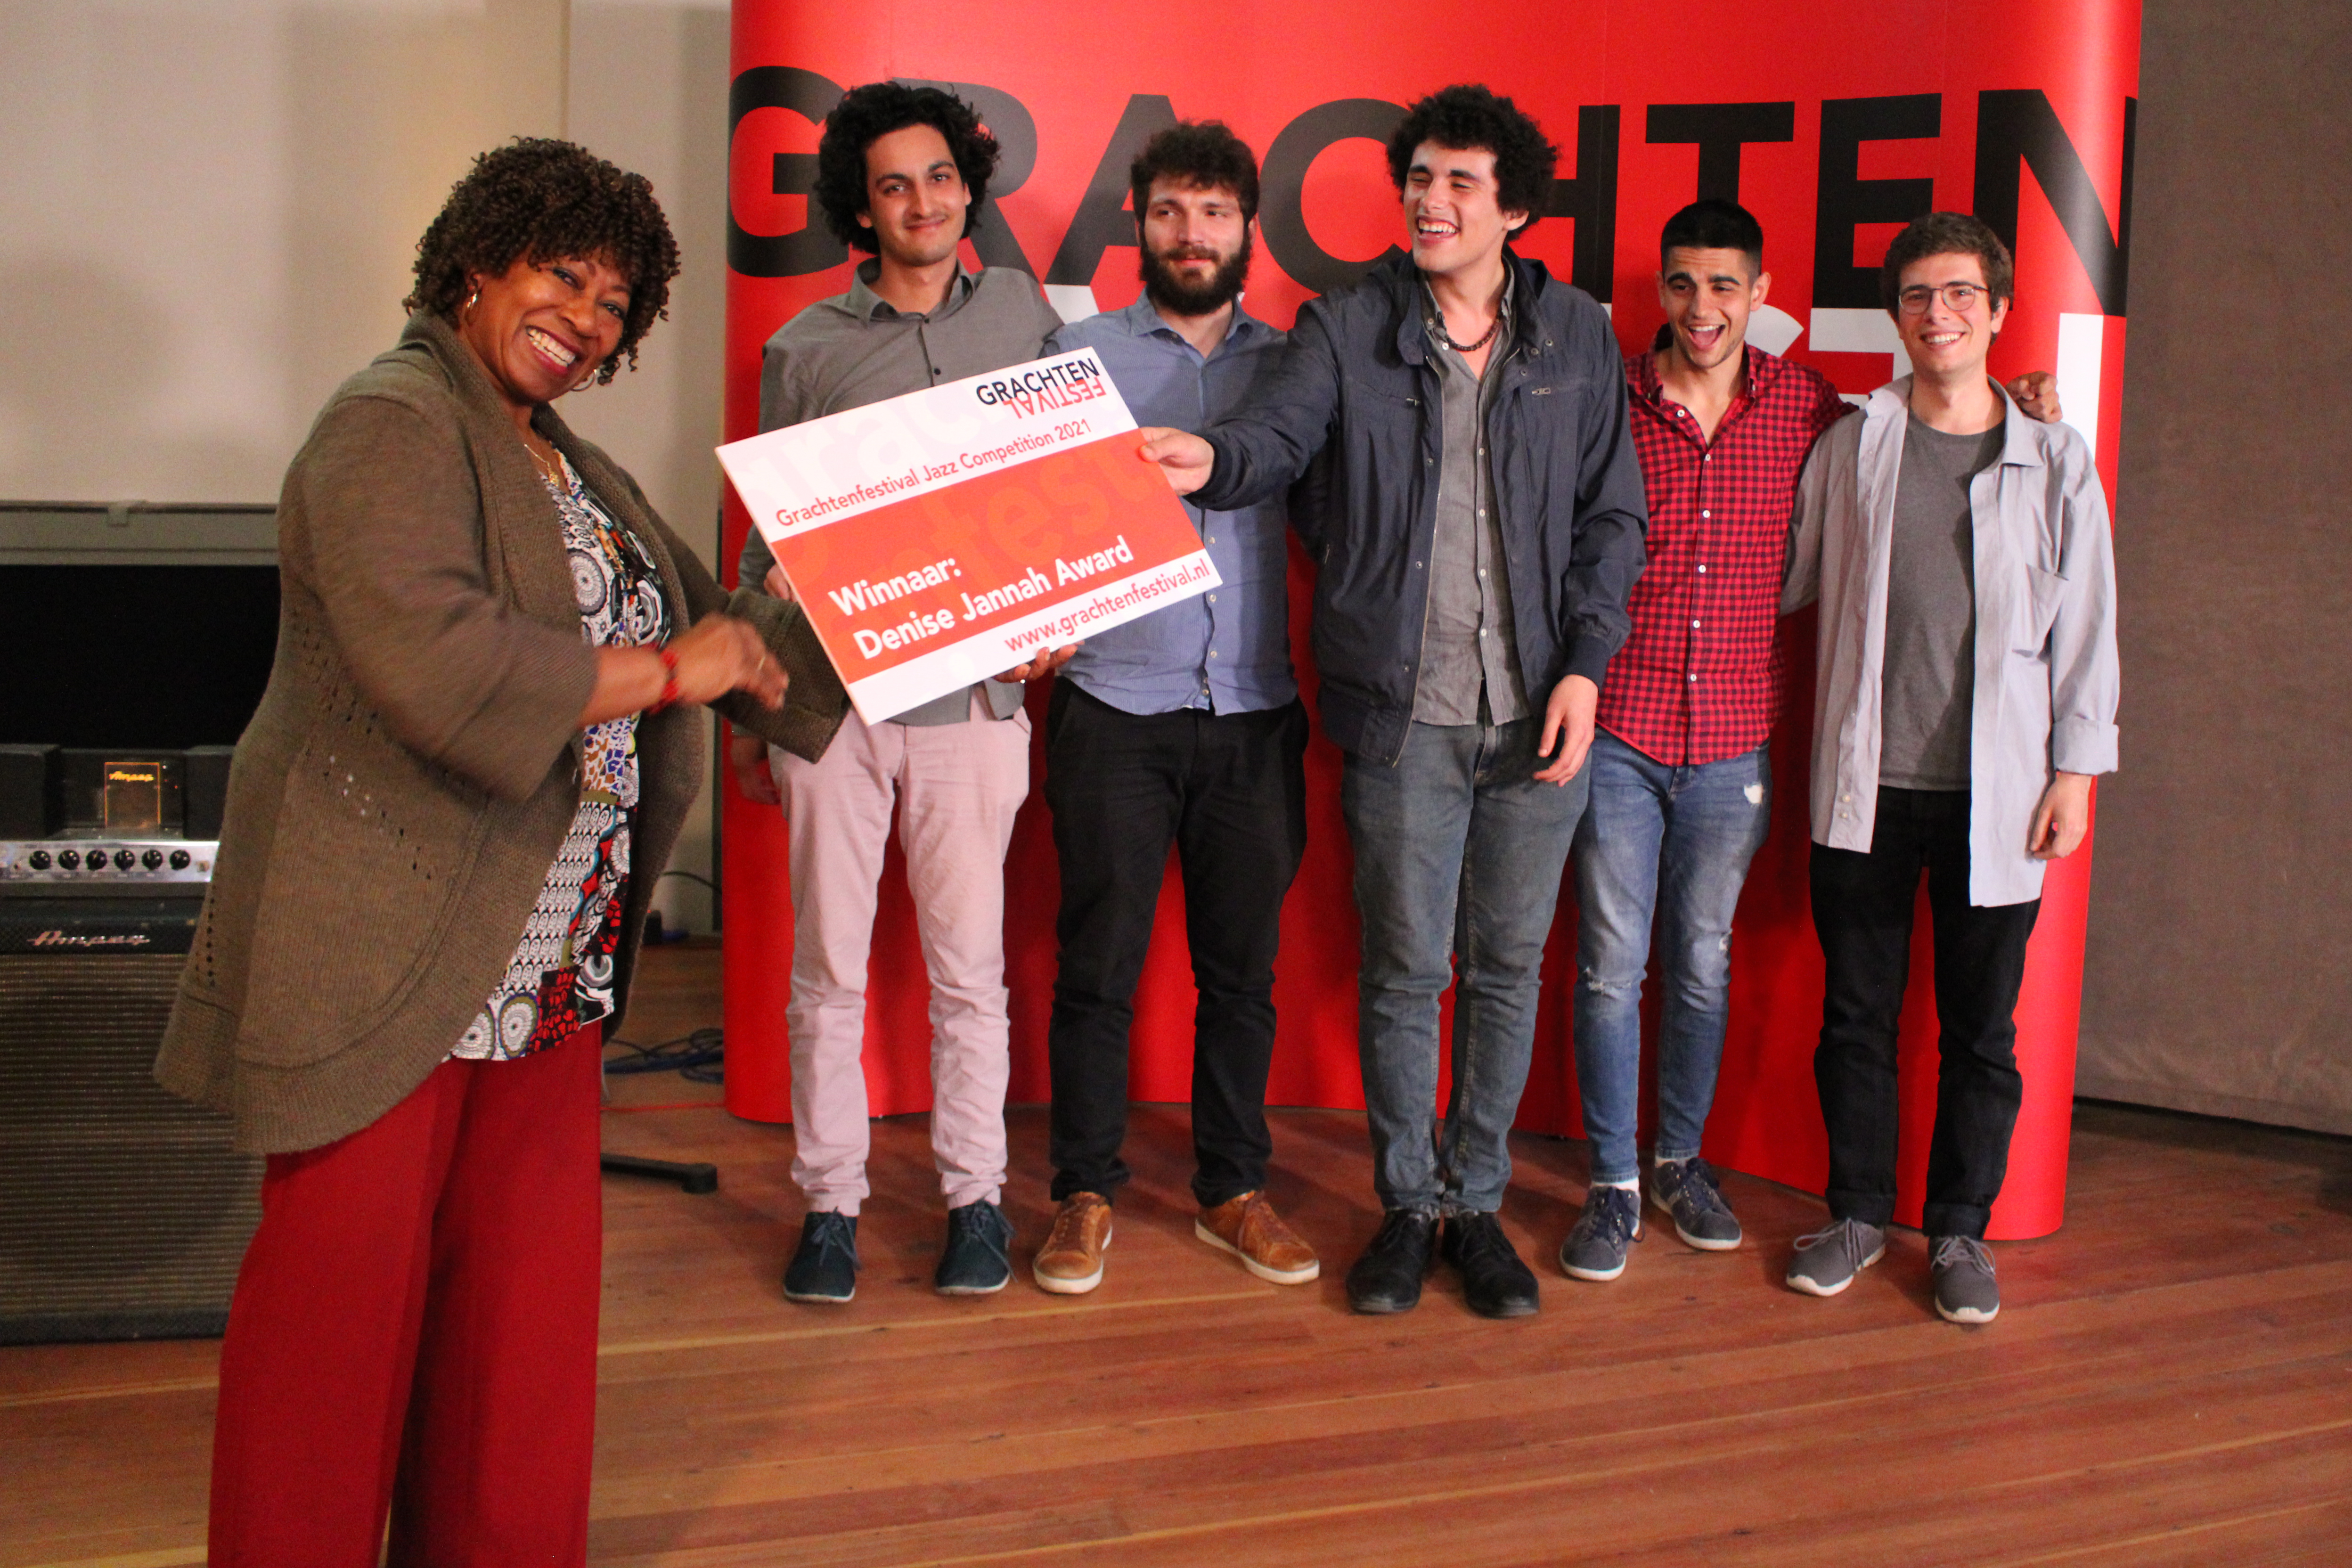 Winnaar Vakjuryprijs & Denise Jennah Award Grachtenfestival Jazz Competition 2021 © Lianne Creemers